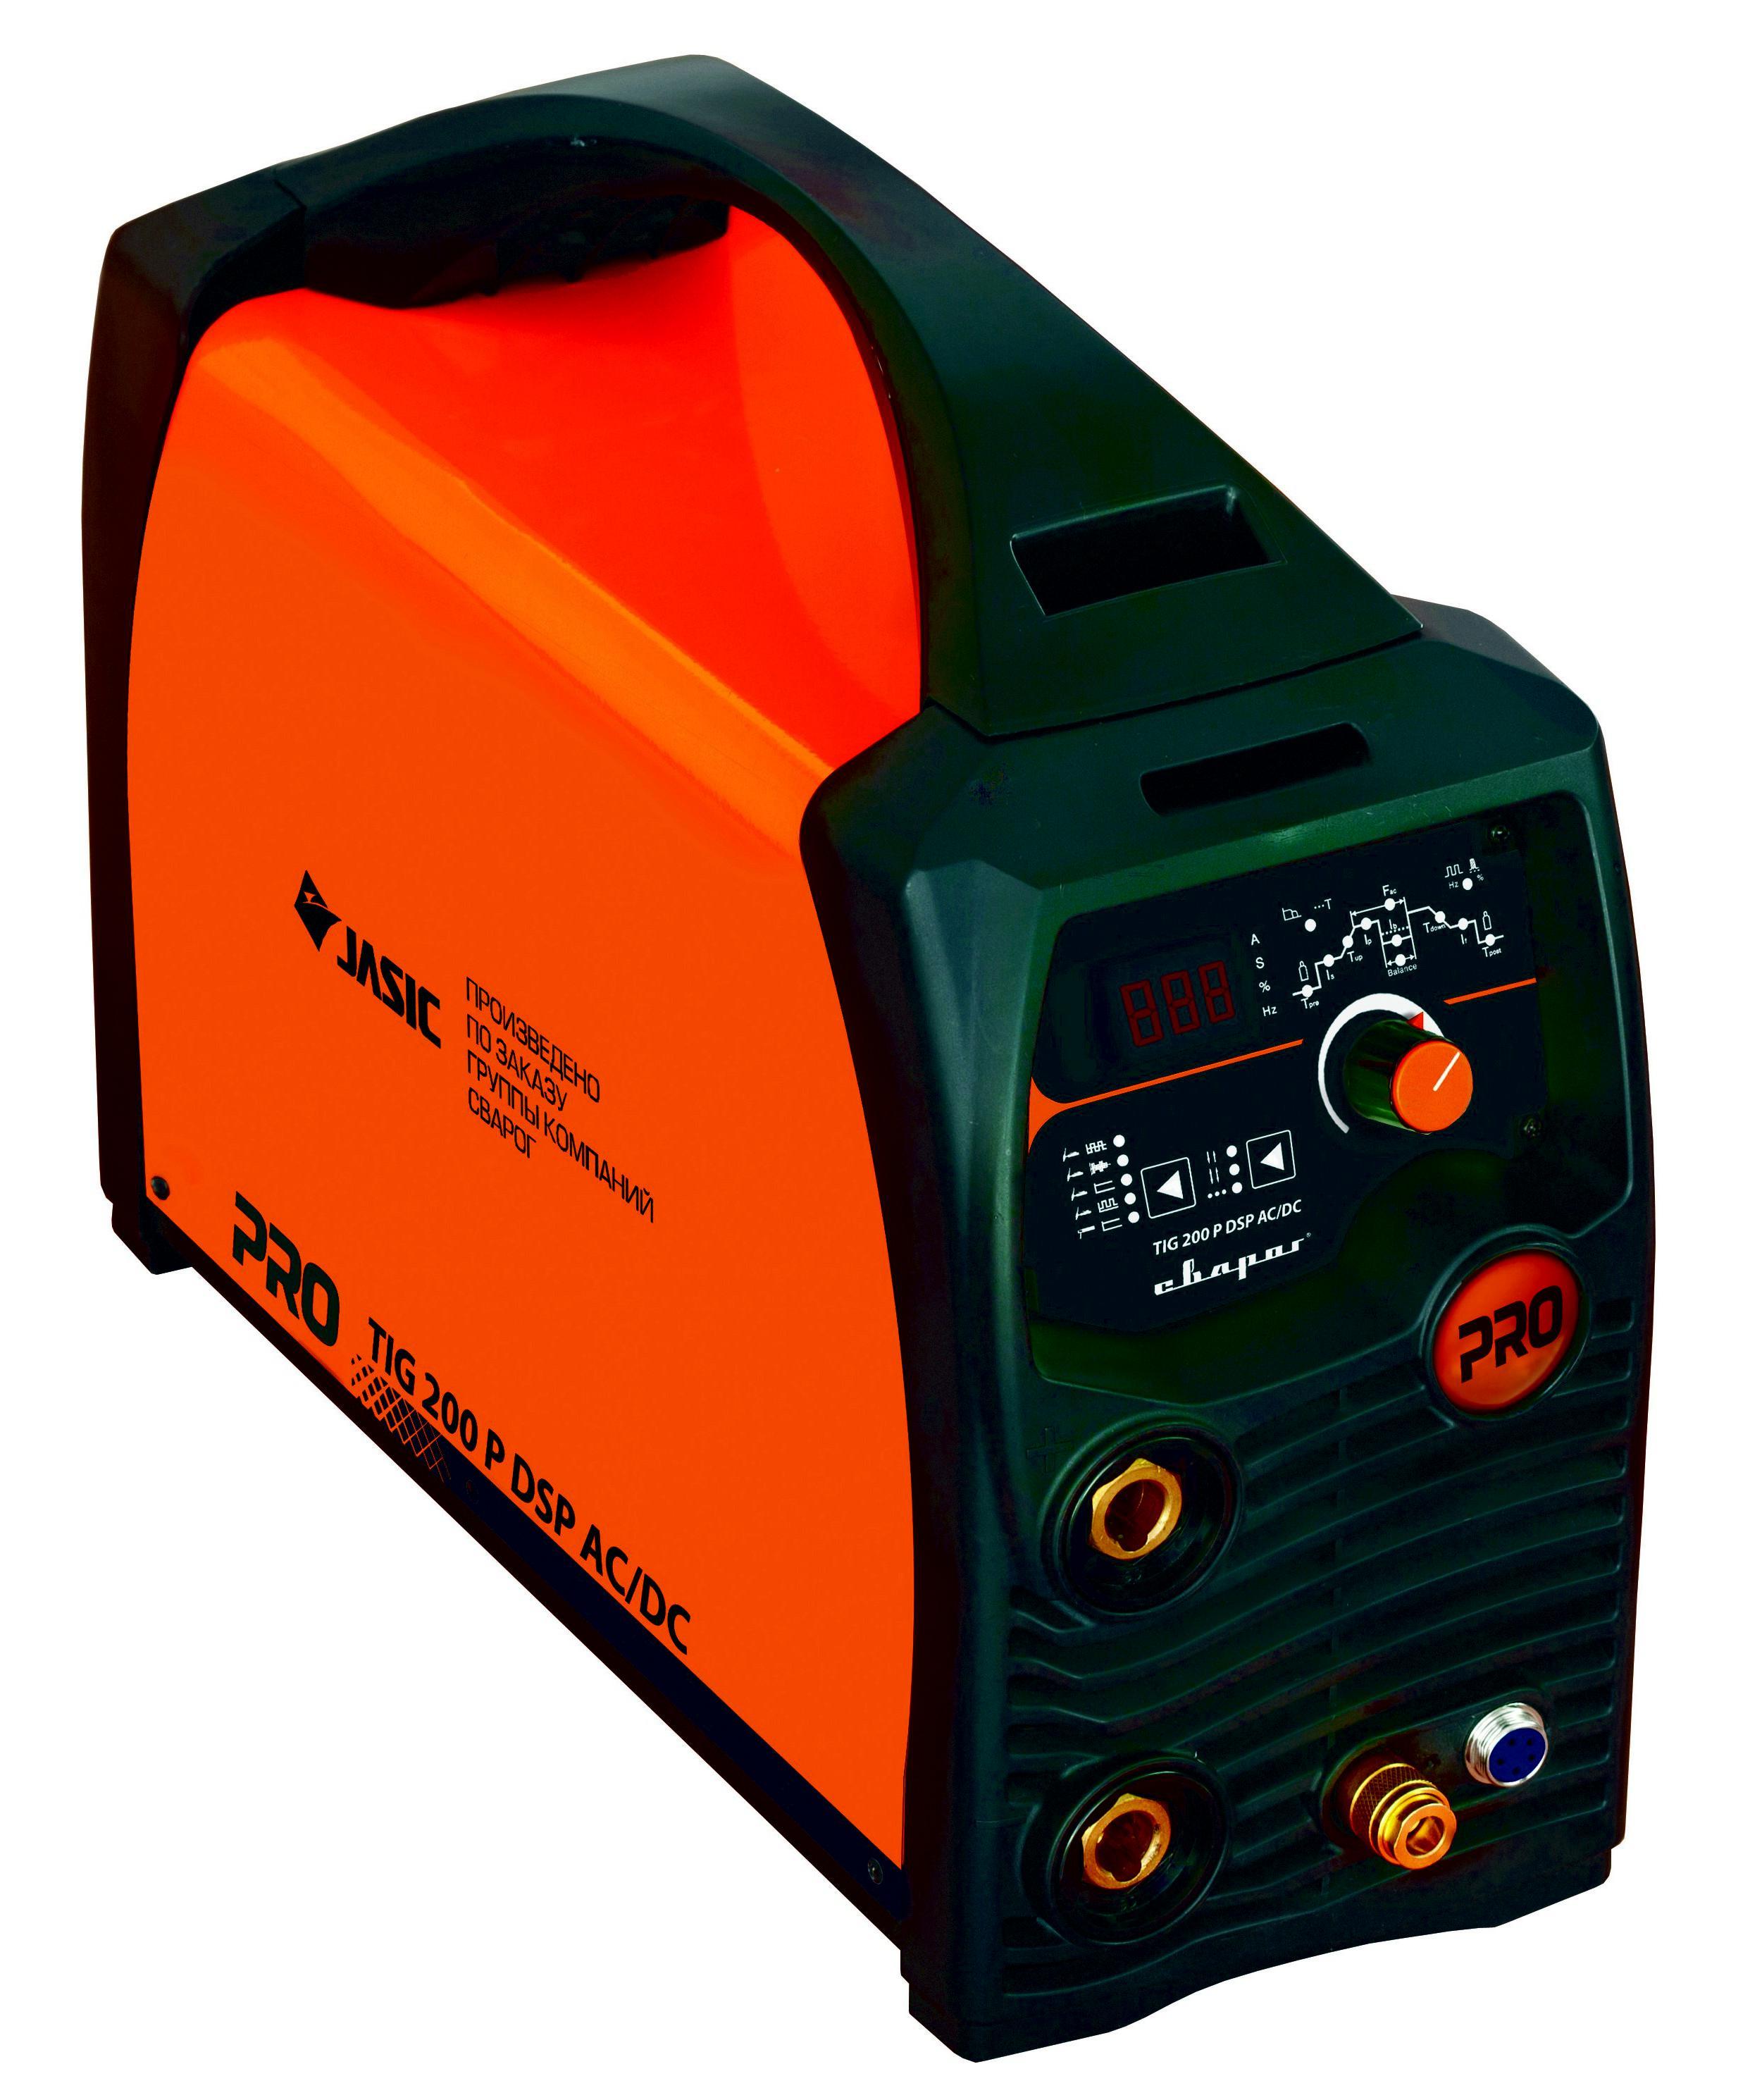 Сварочный аппарат СВАРОГ Pro tig 200 p dsp ac/dc (e201) сварочный аппарат сварог pro tig 200 p dsp w212